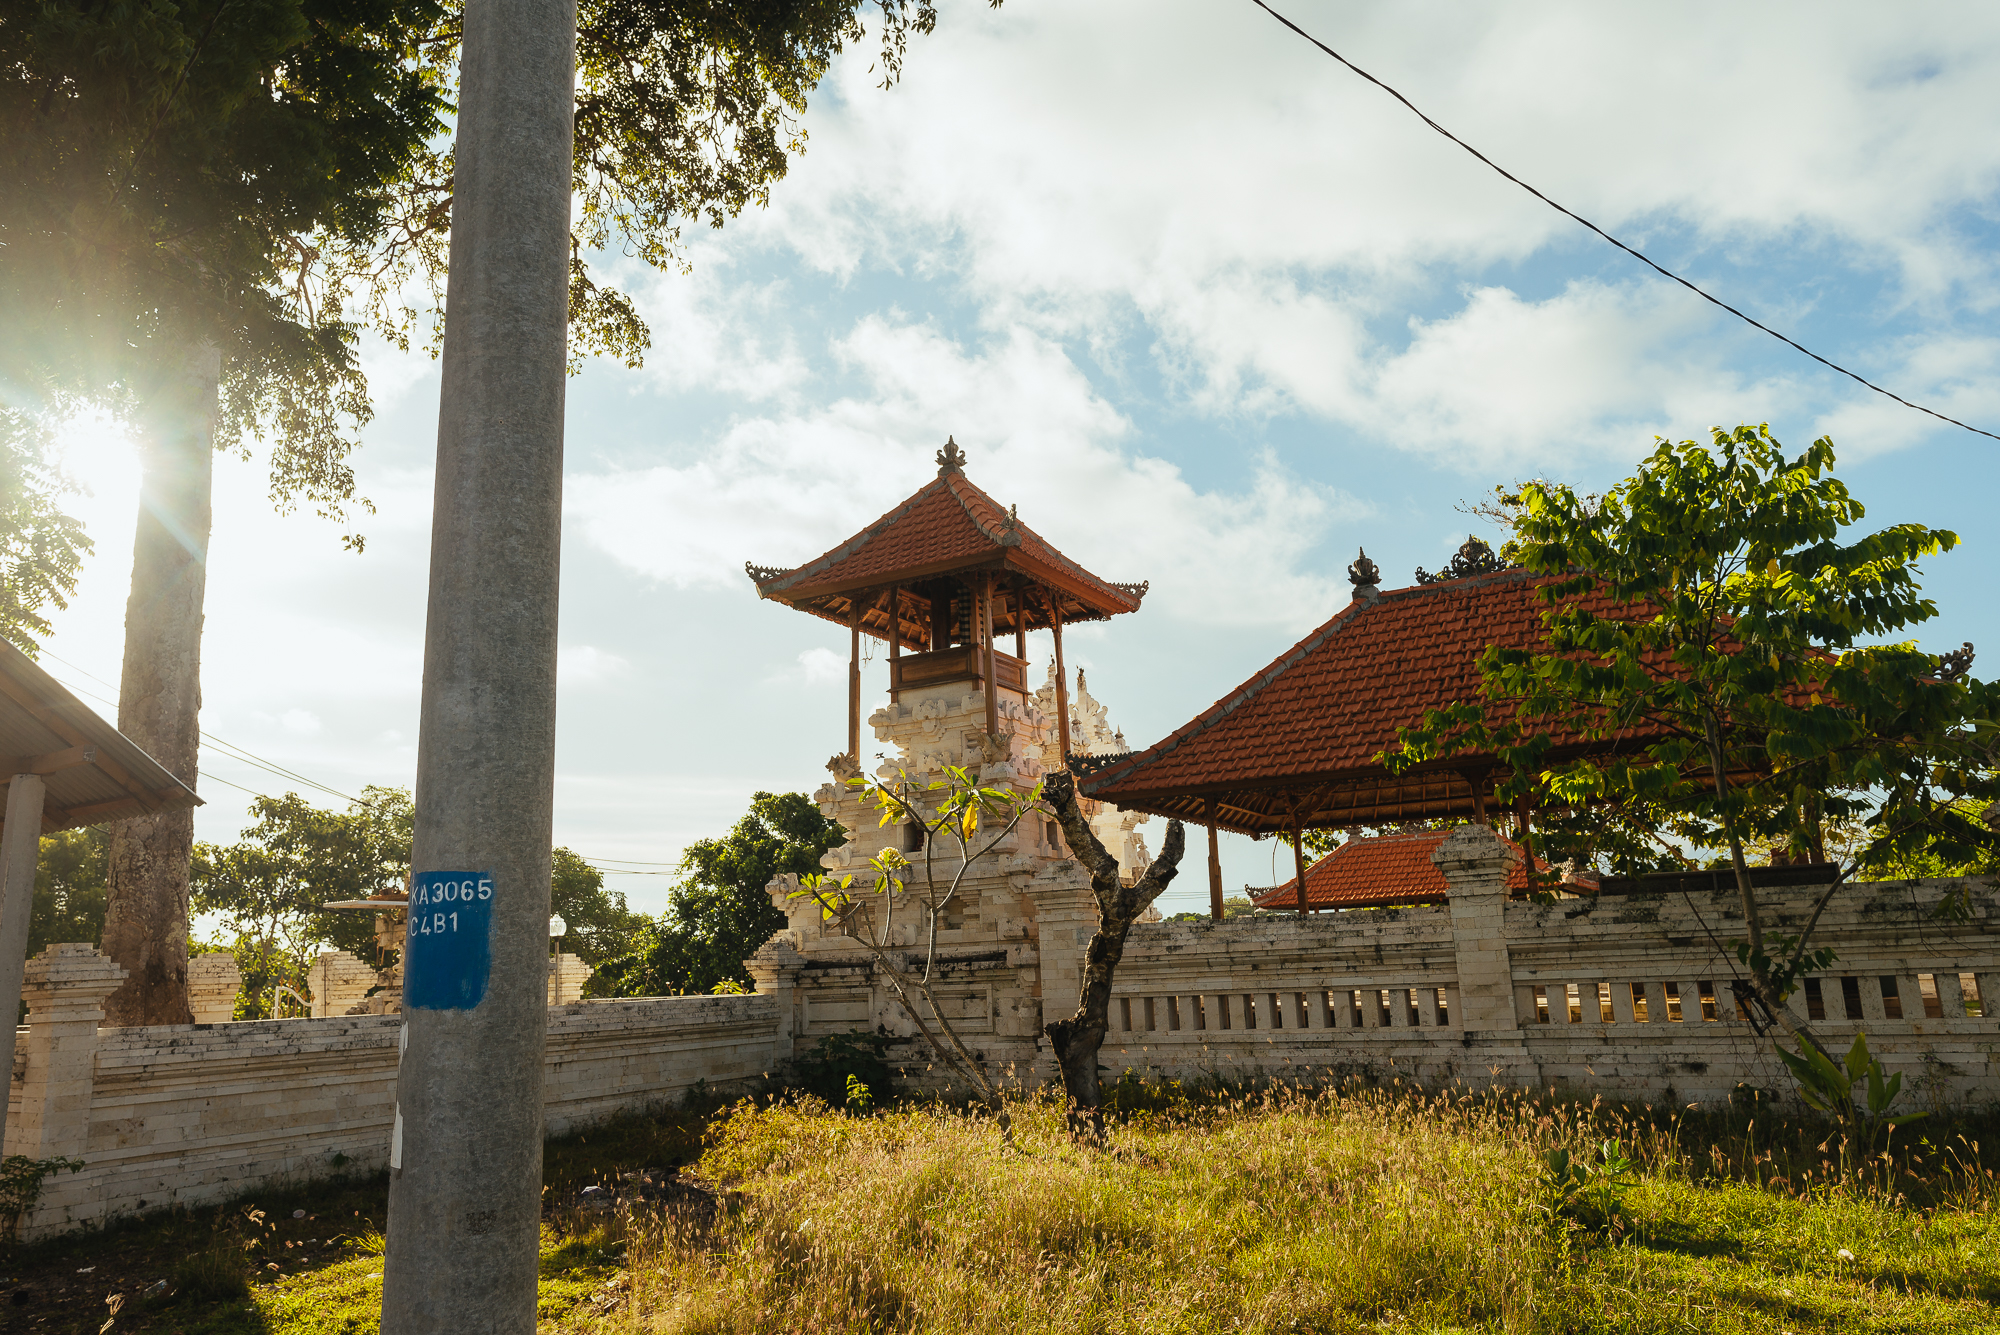 indonesia_2017-129.jpg